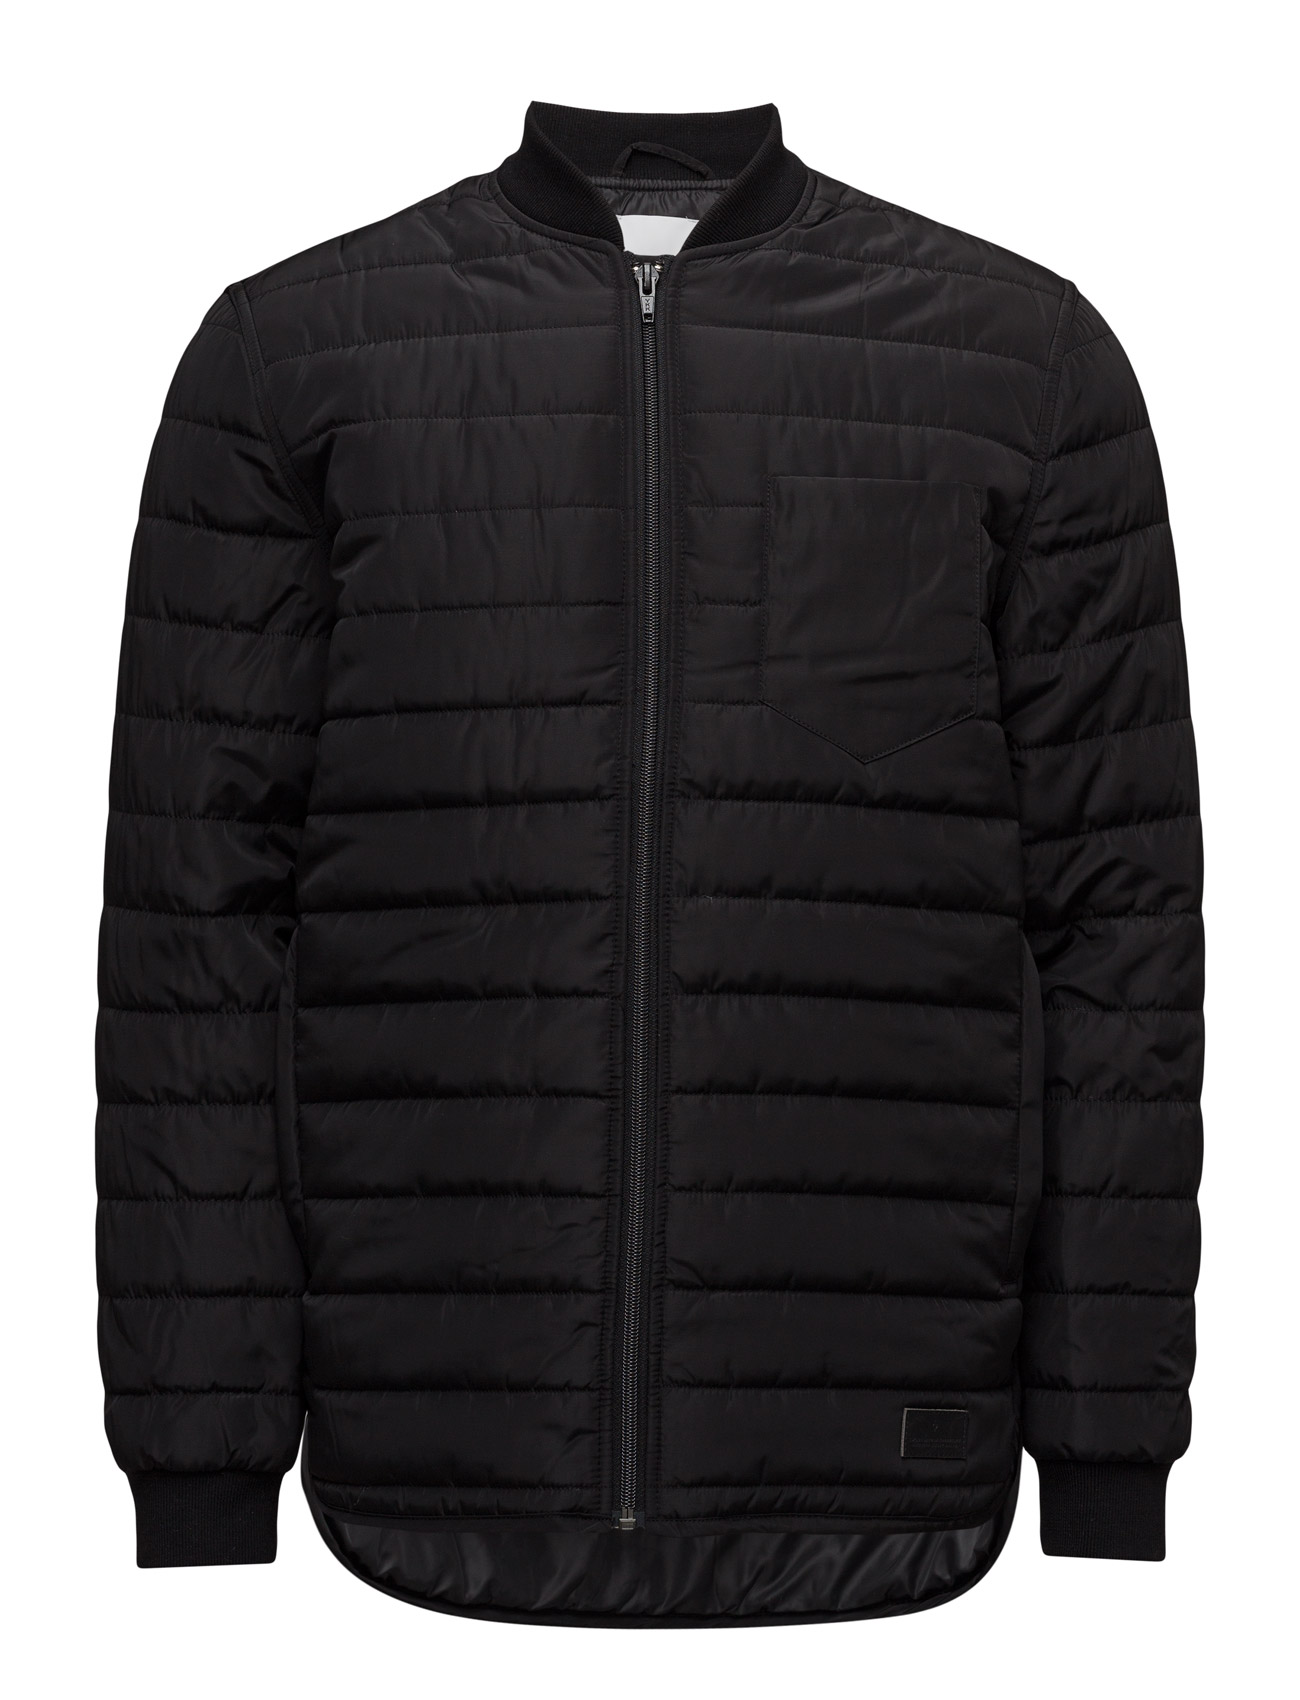 samsã¸e & samsã¸e – Shaw jacket 7177 på boozt.com dk